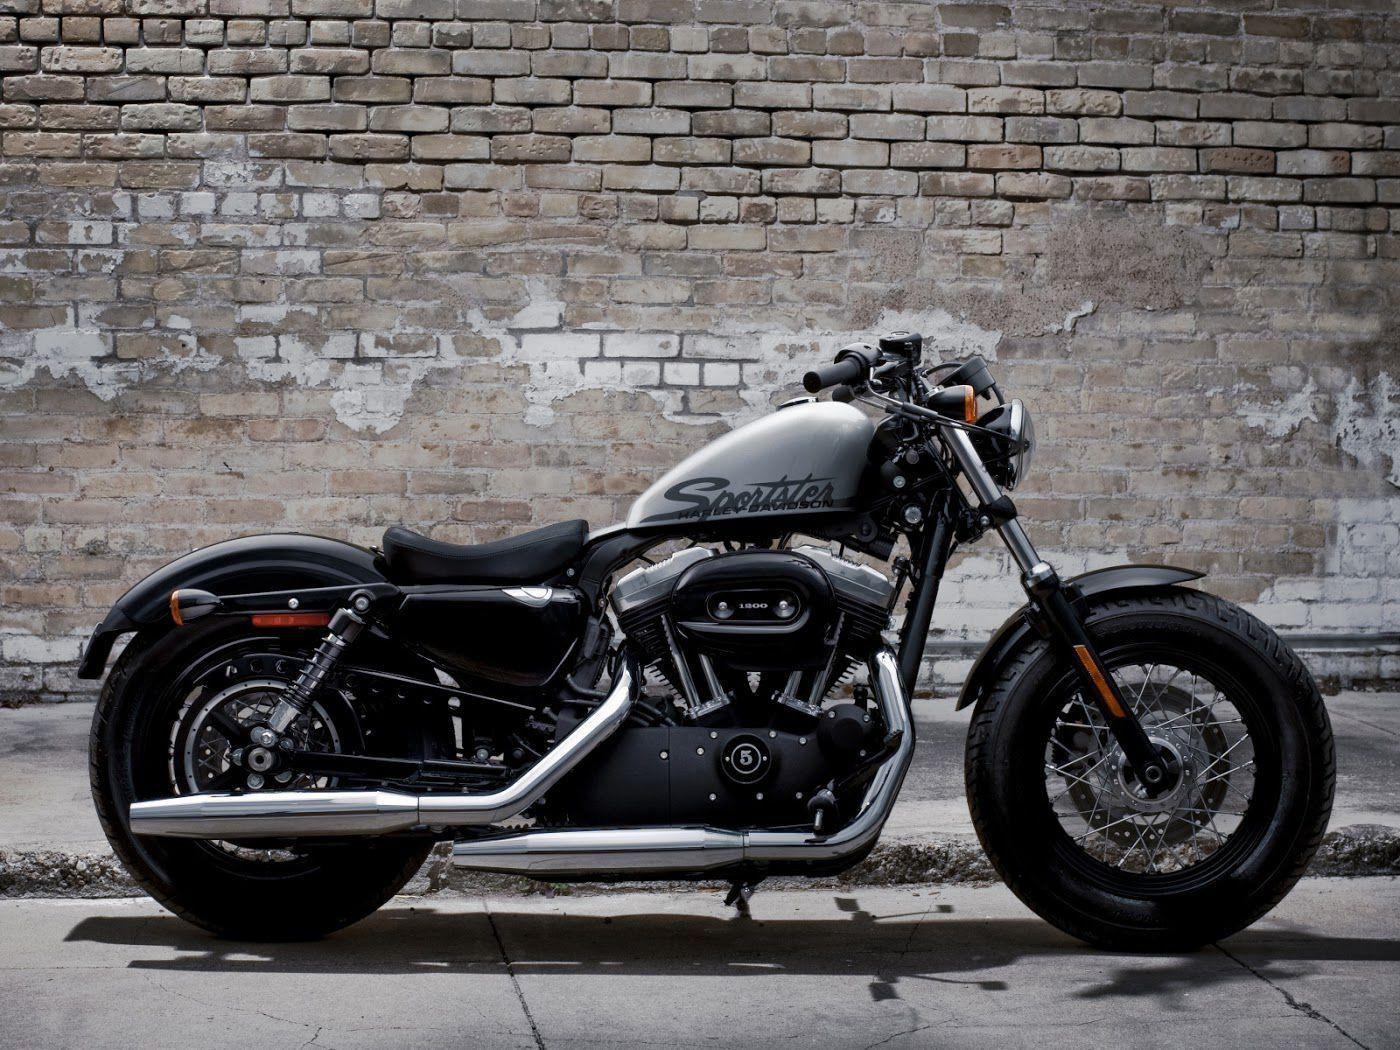 Harley Davidson Wallpaper 0543